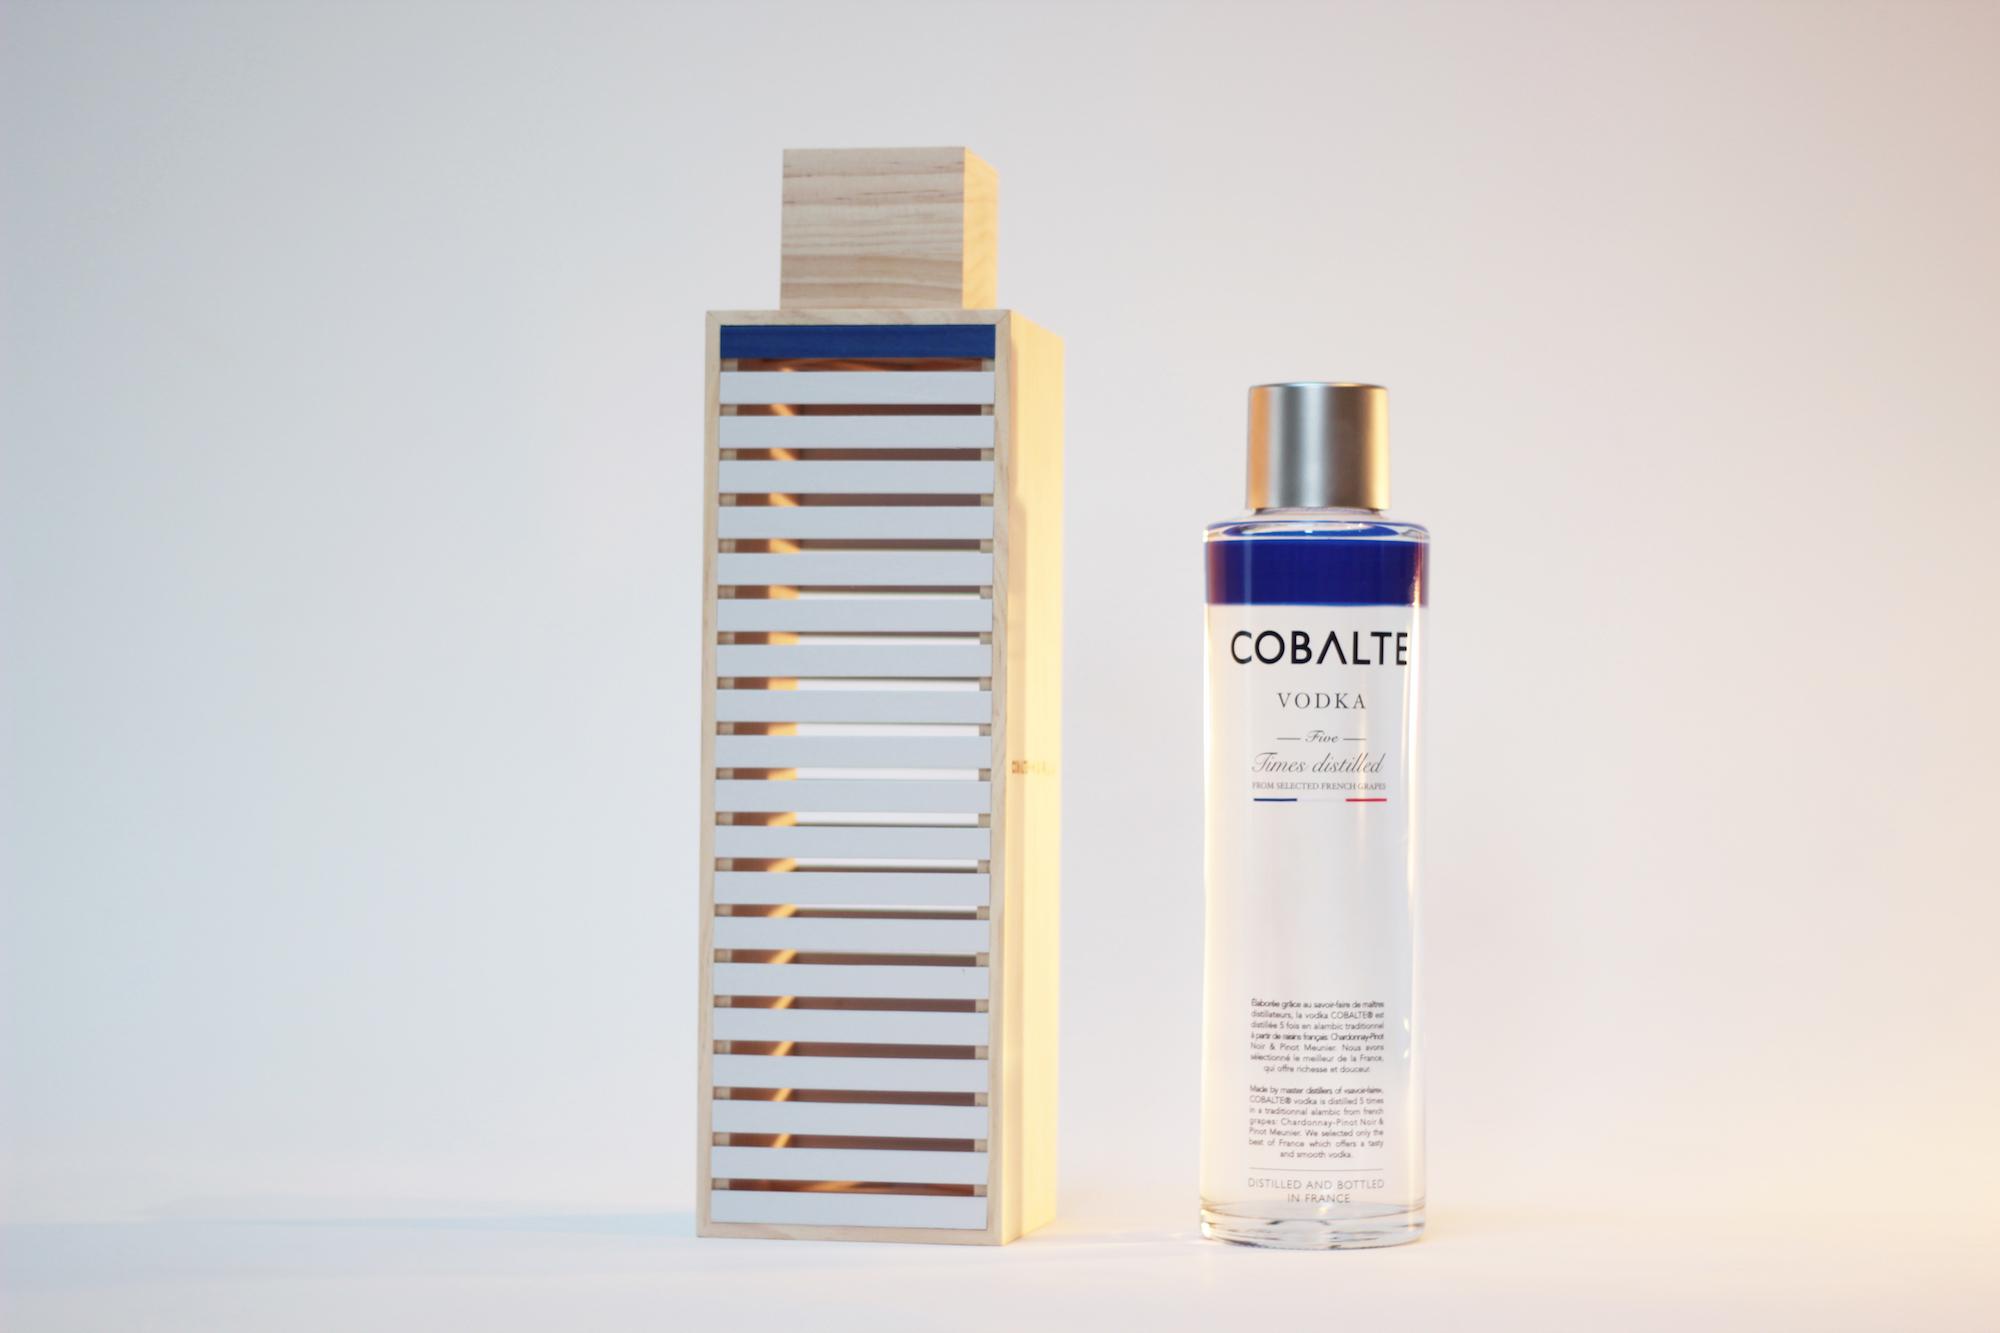 COBALTExHURLU pack Vodka3